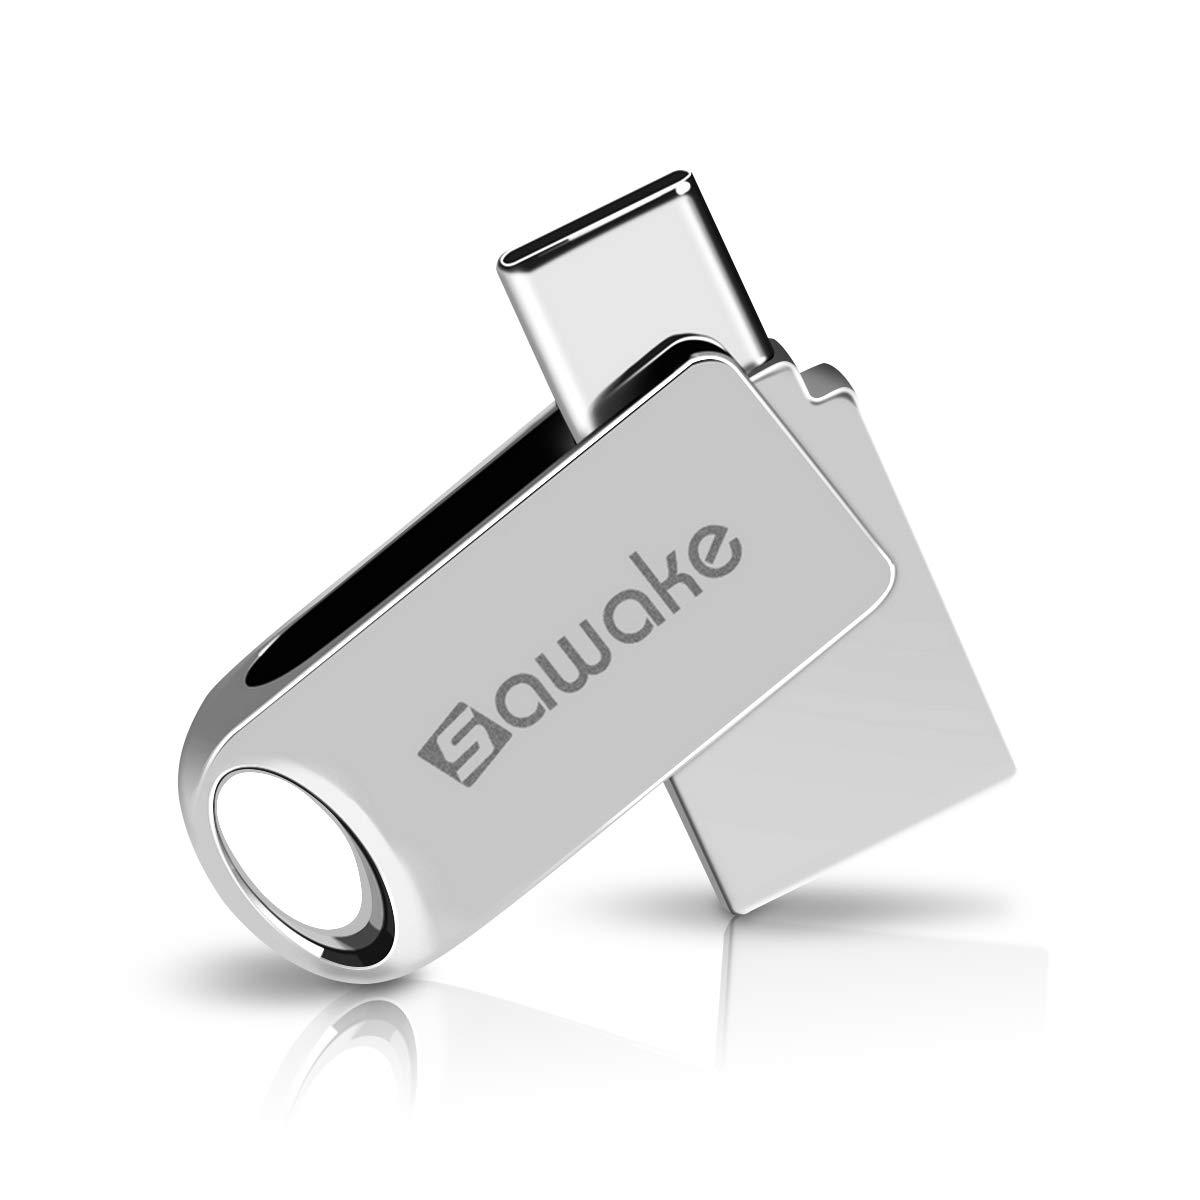 USB C Flash Drive, SAWAKE 64GB USB 3.0 Type C Waterproof Thumb Drive, Dual Drive Memory Stick with Keychain for Android Smartphone/New MacBook/Google's Chromebook Pixel